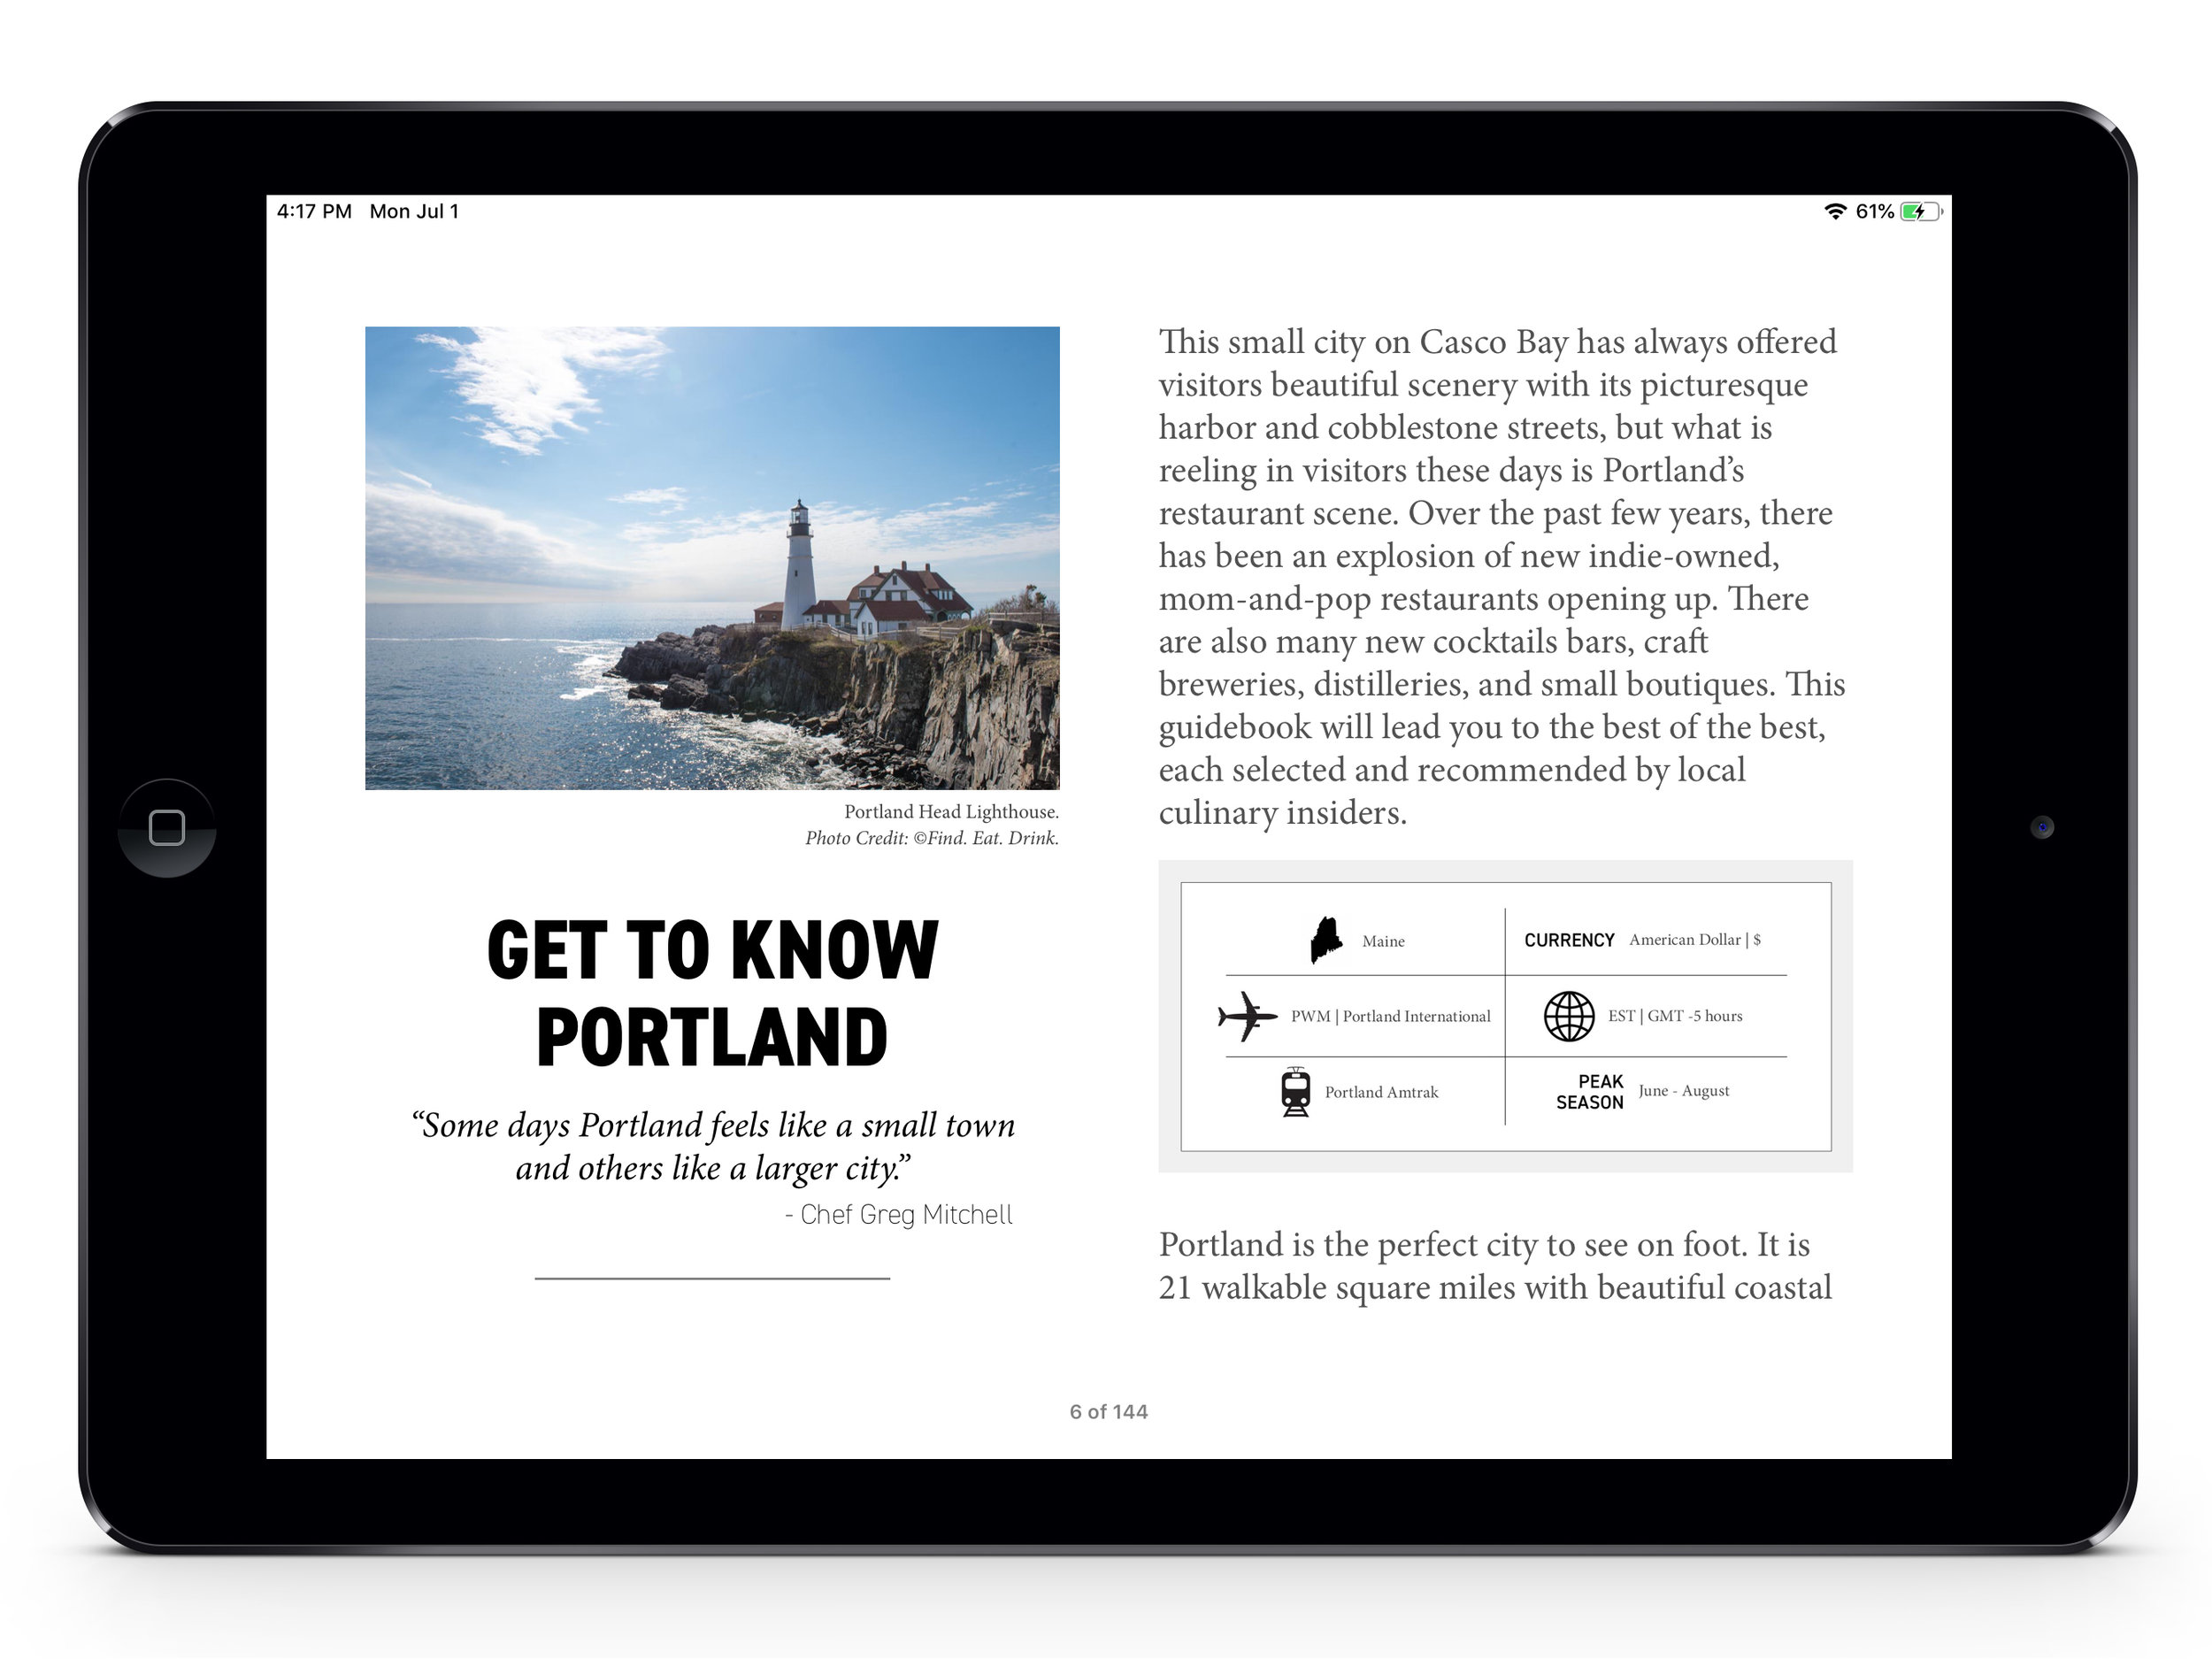 iPadAir_PortlandME_Screenshots_Landscape_1.3.jpg